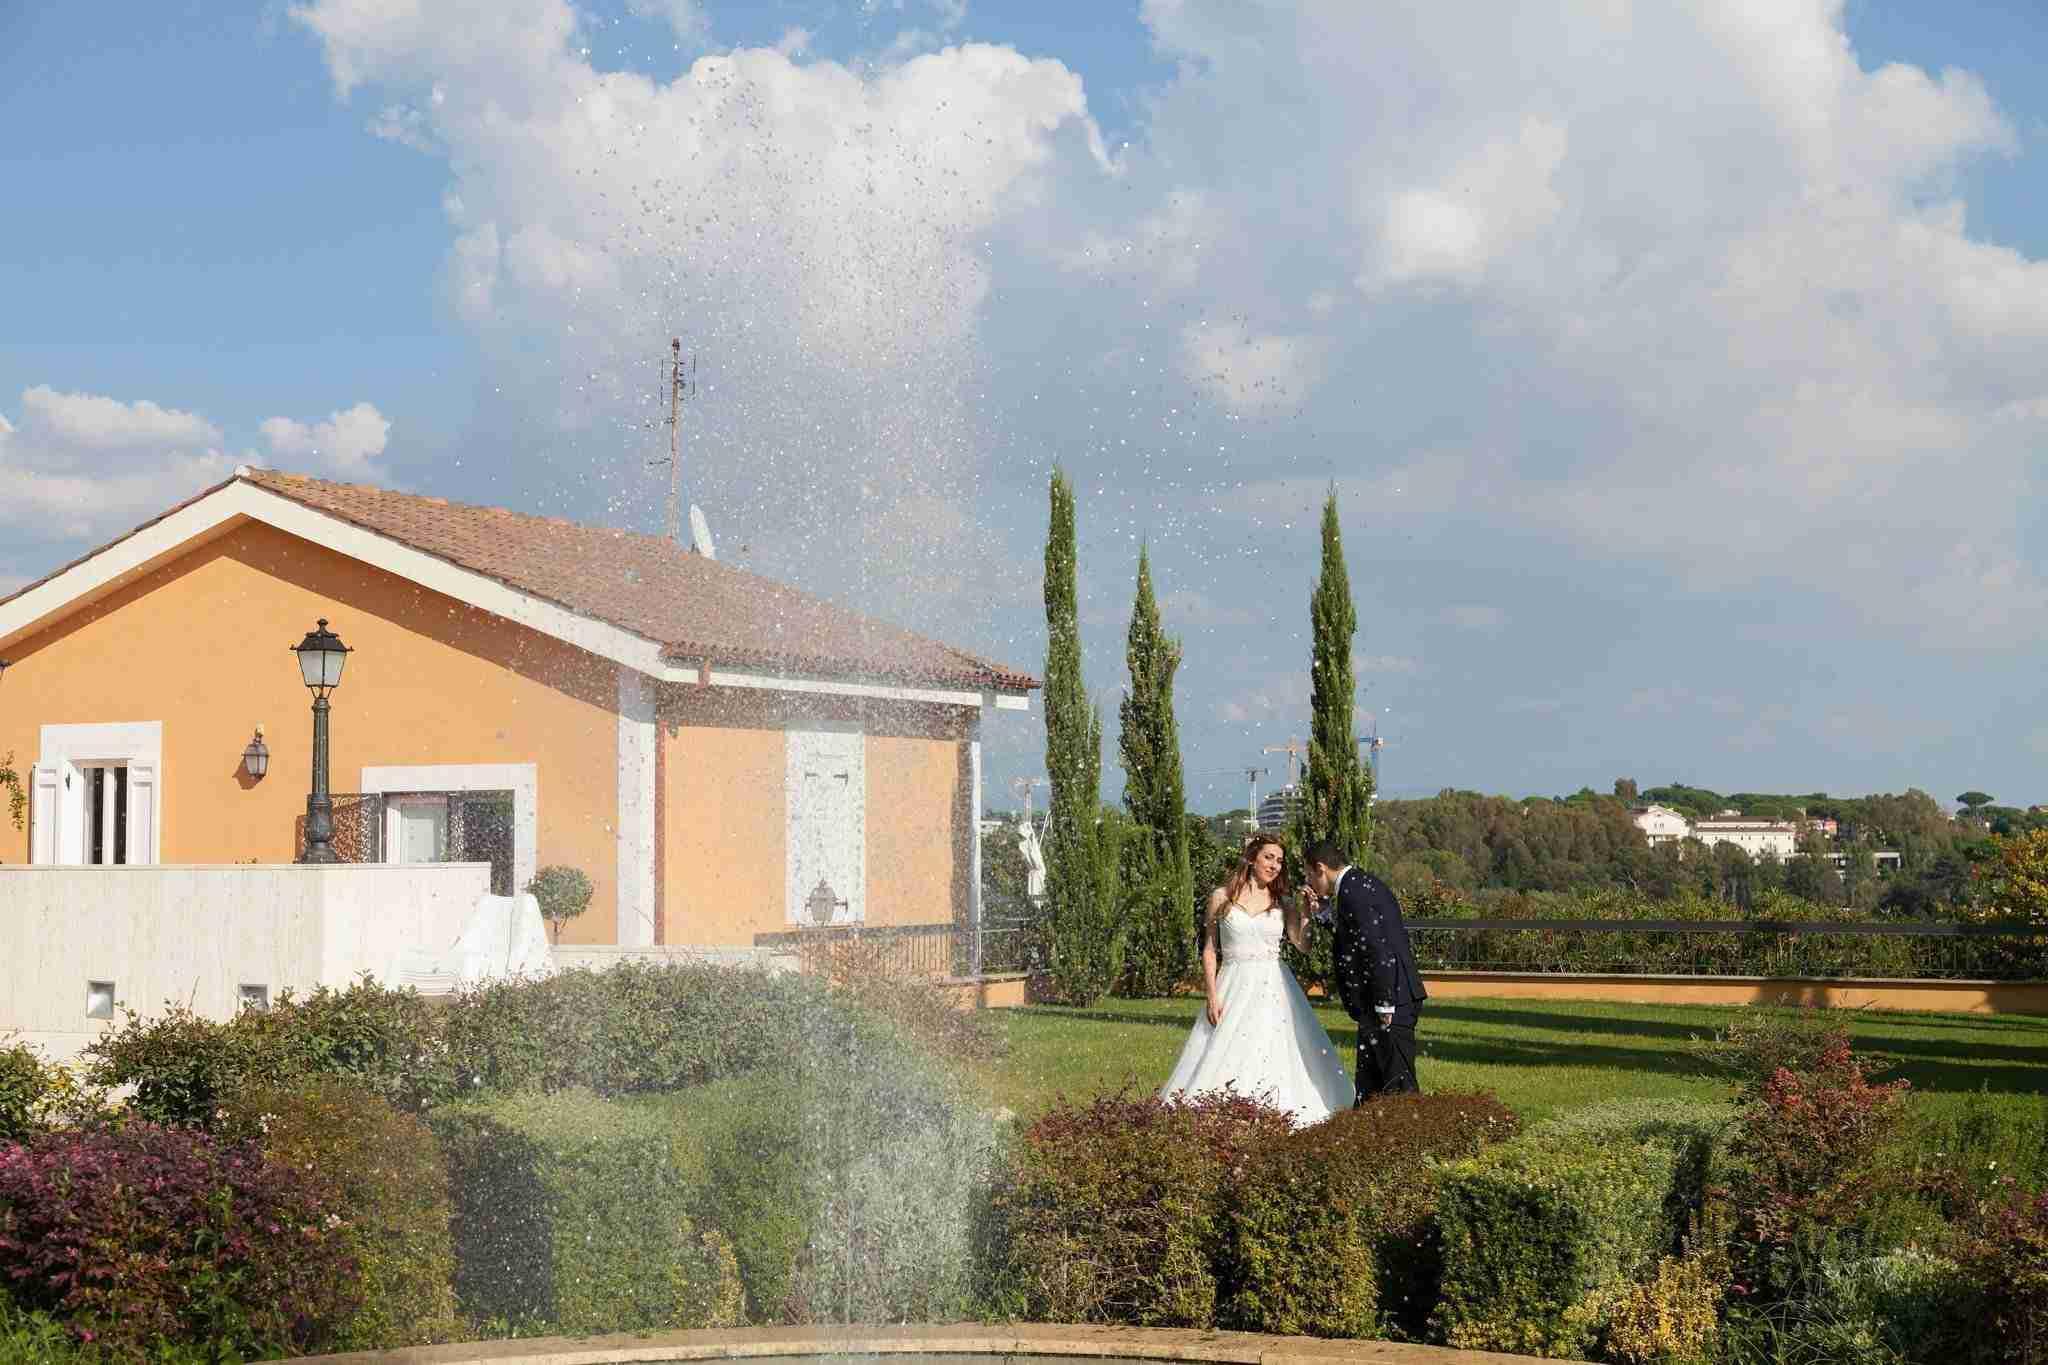 Matrimonio al Casale Realmonte: Esterno, giardino